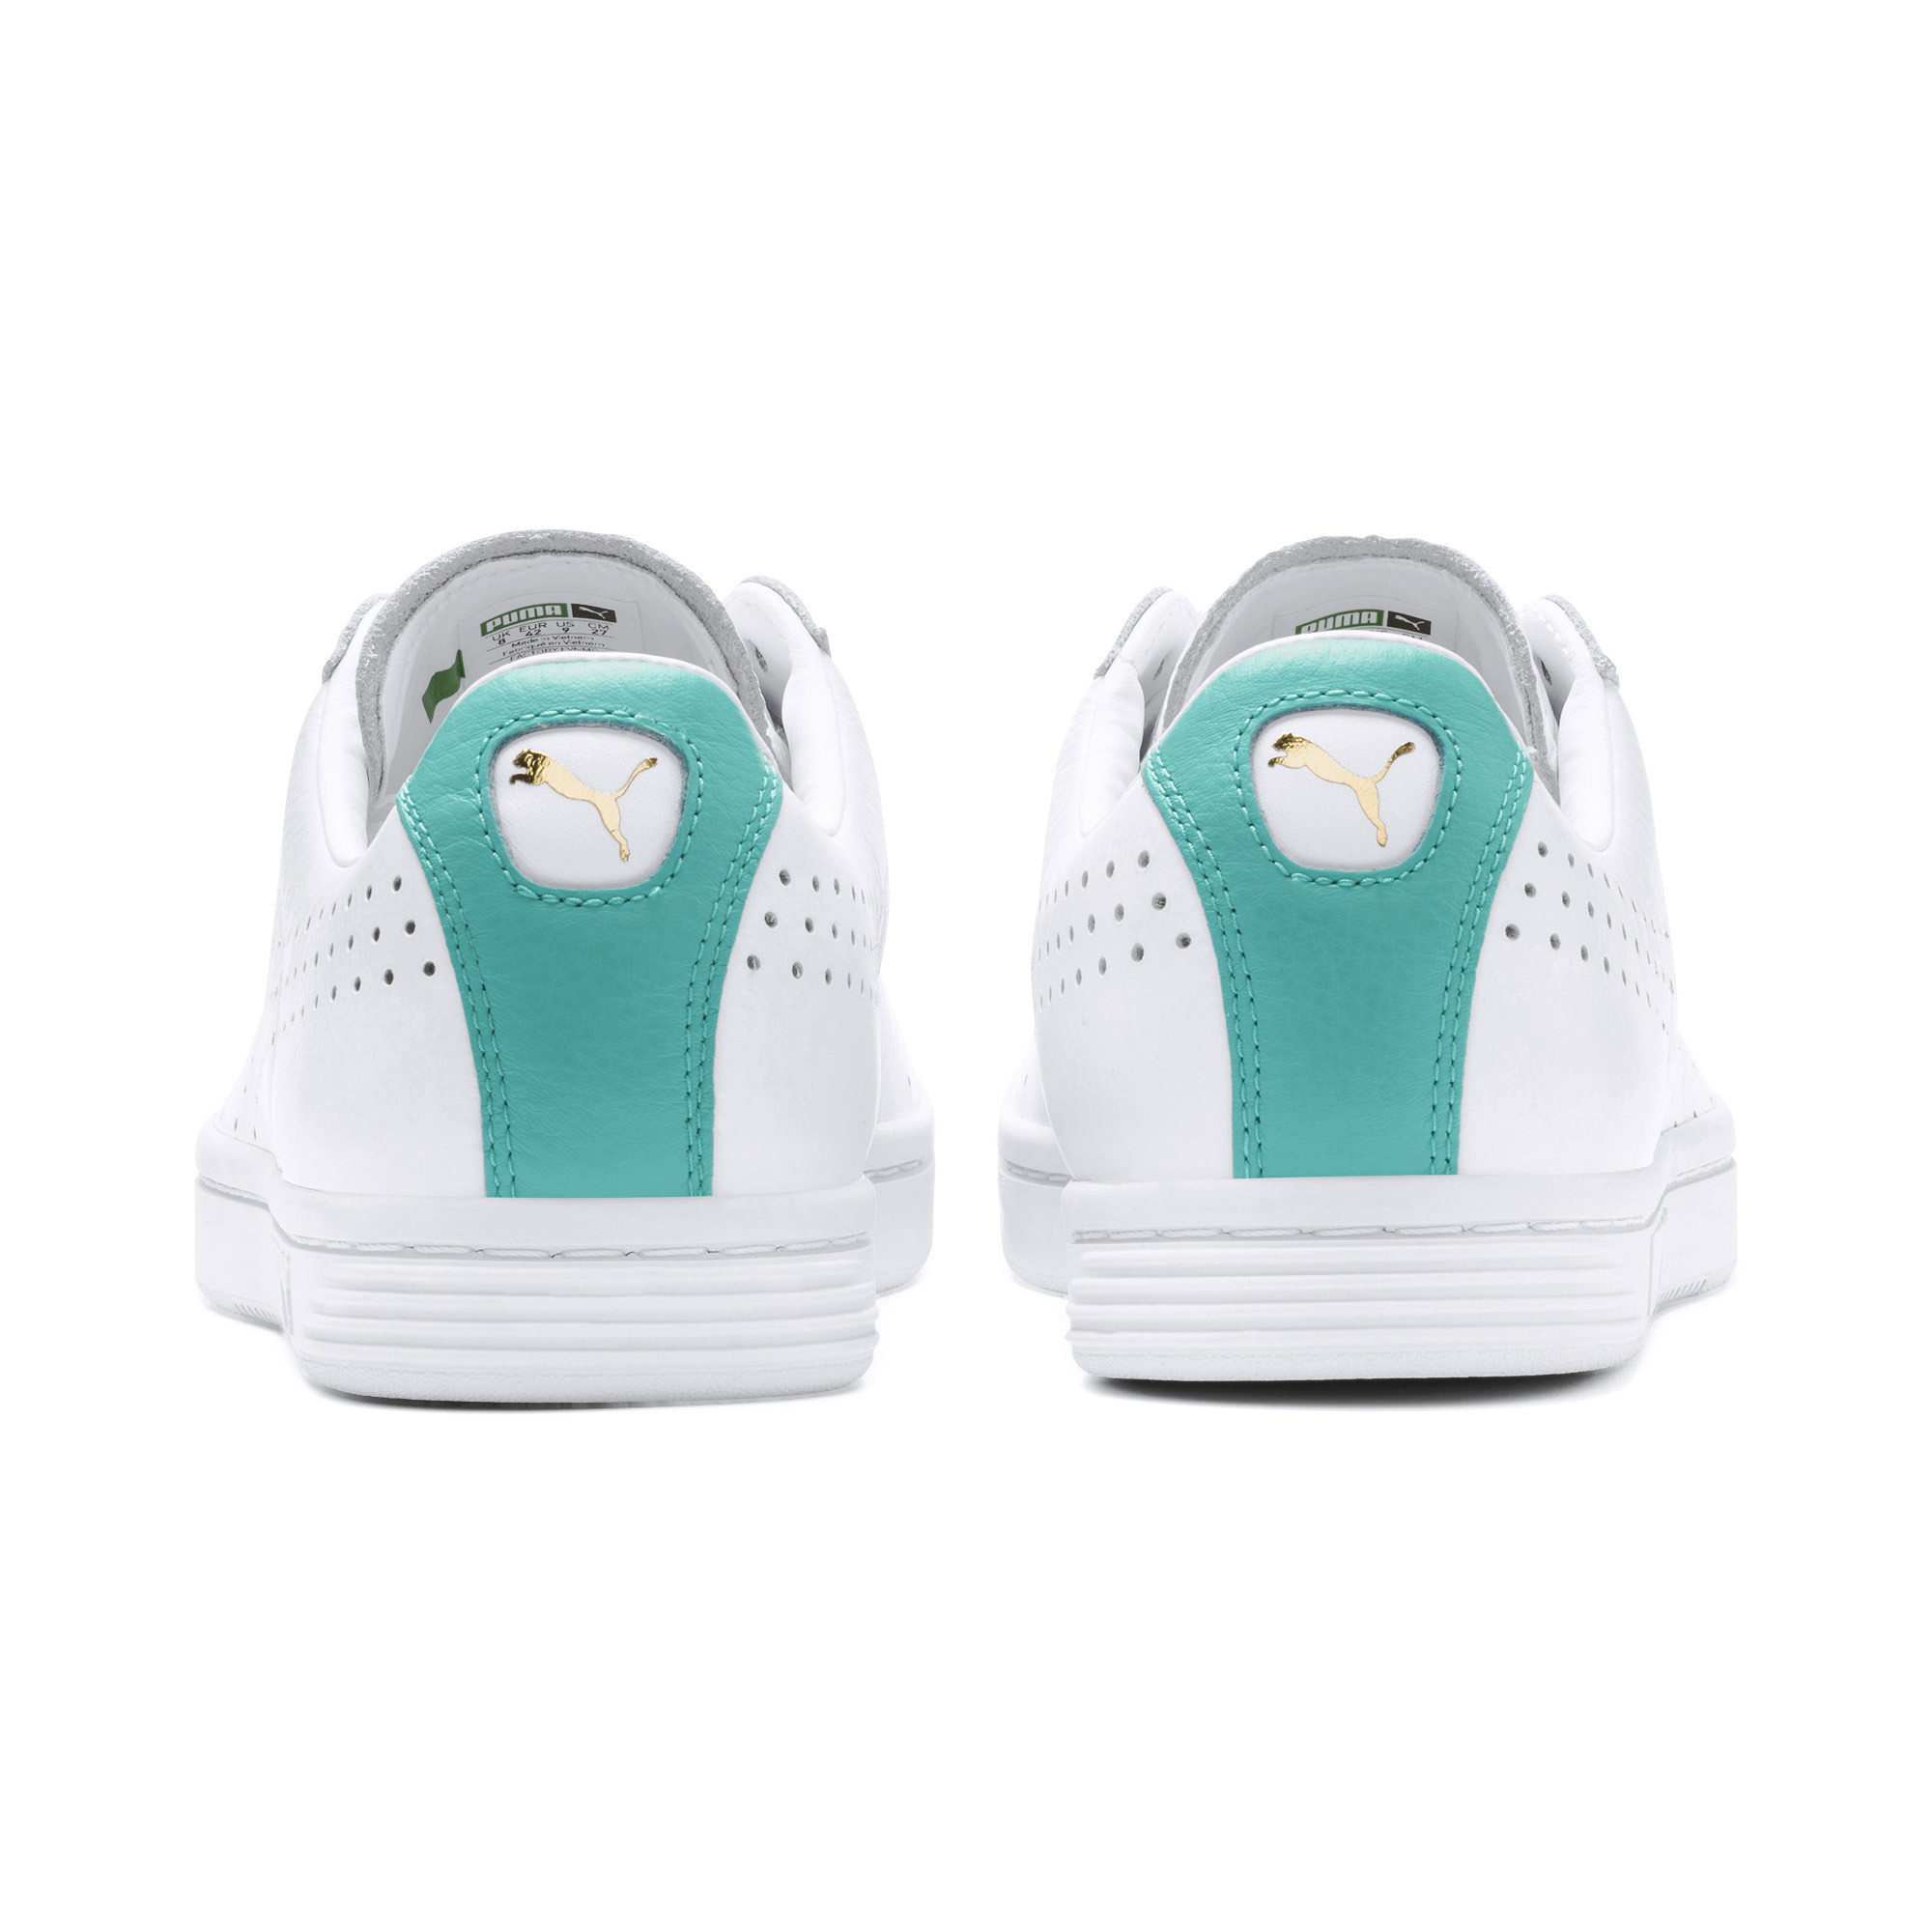 PUMA-Court-Star-Men-039-s-Sneakers-Unisex-Shoe-Sport-Classics thumbnail 3